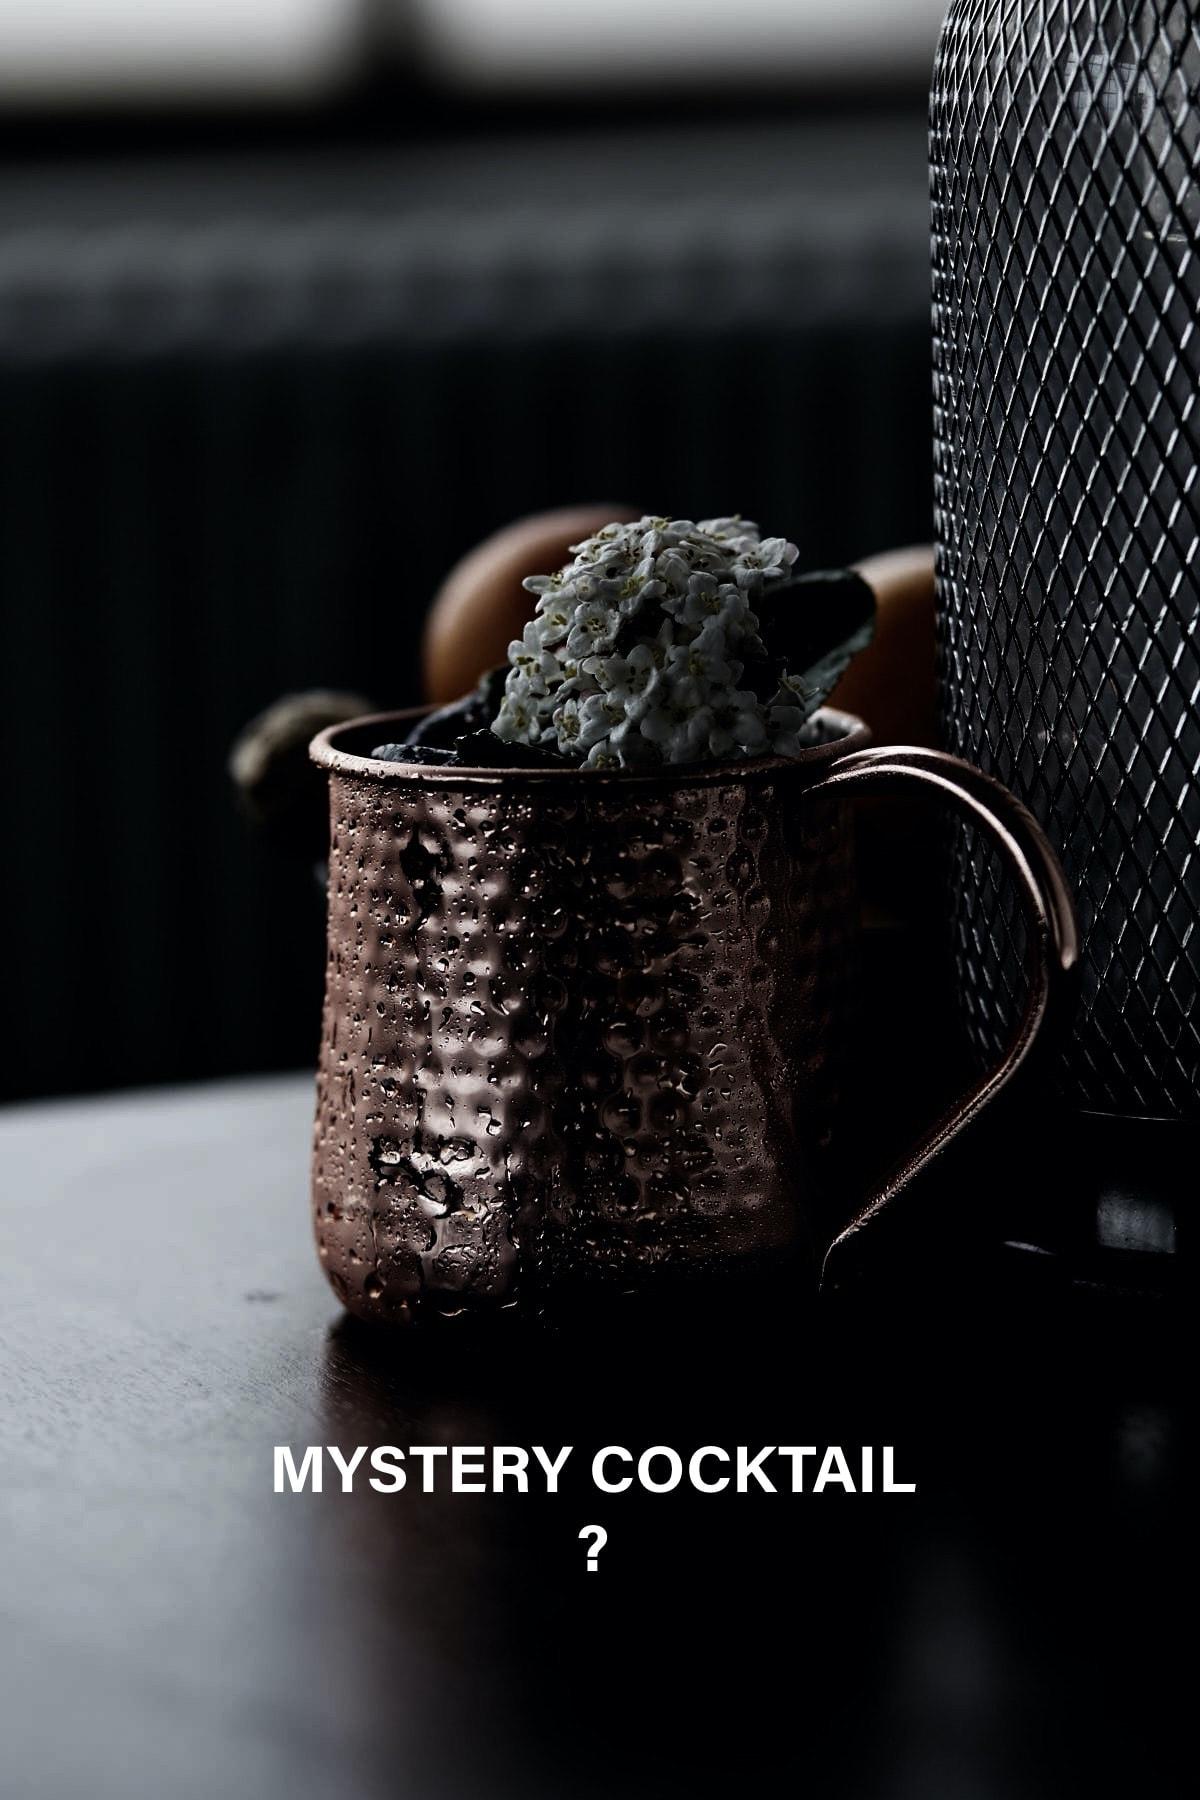 Mystery Cocktail til virtuelt kaffekursus med Topbrewer og CCA